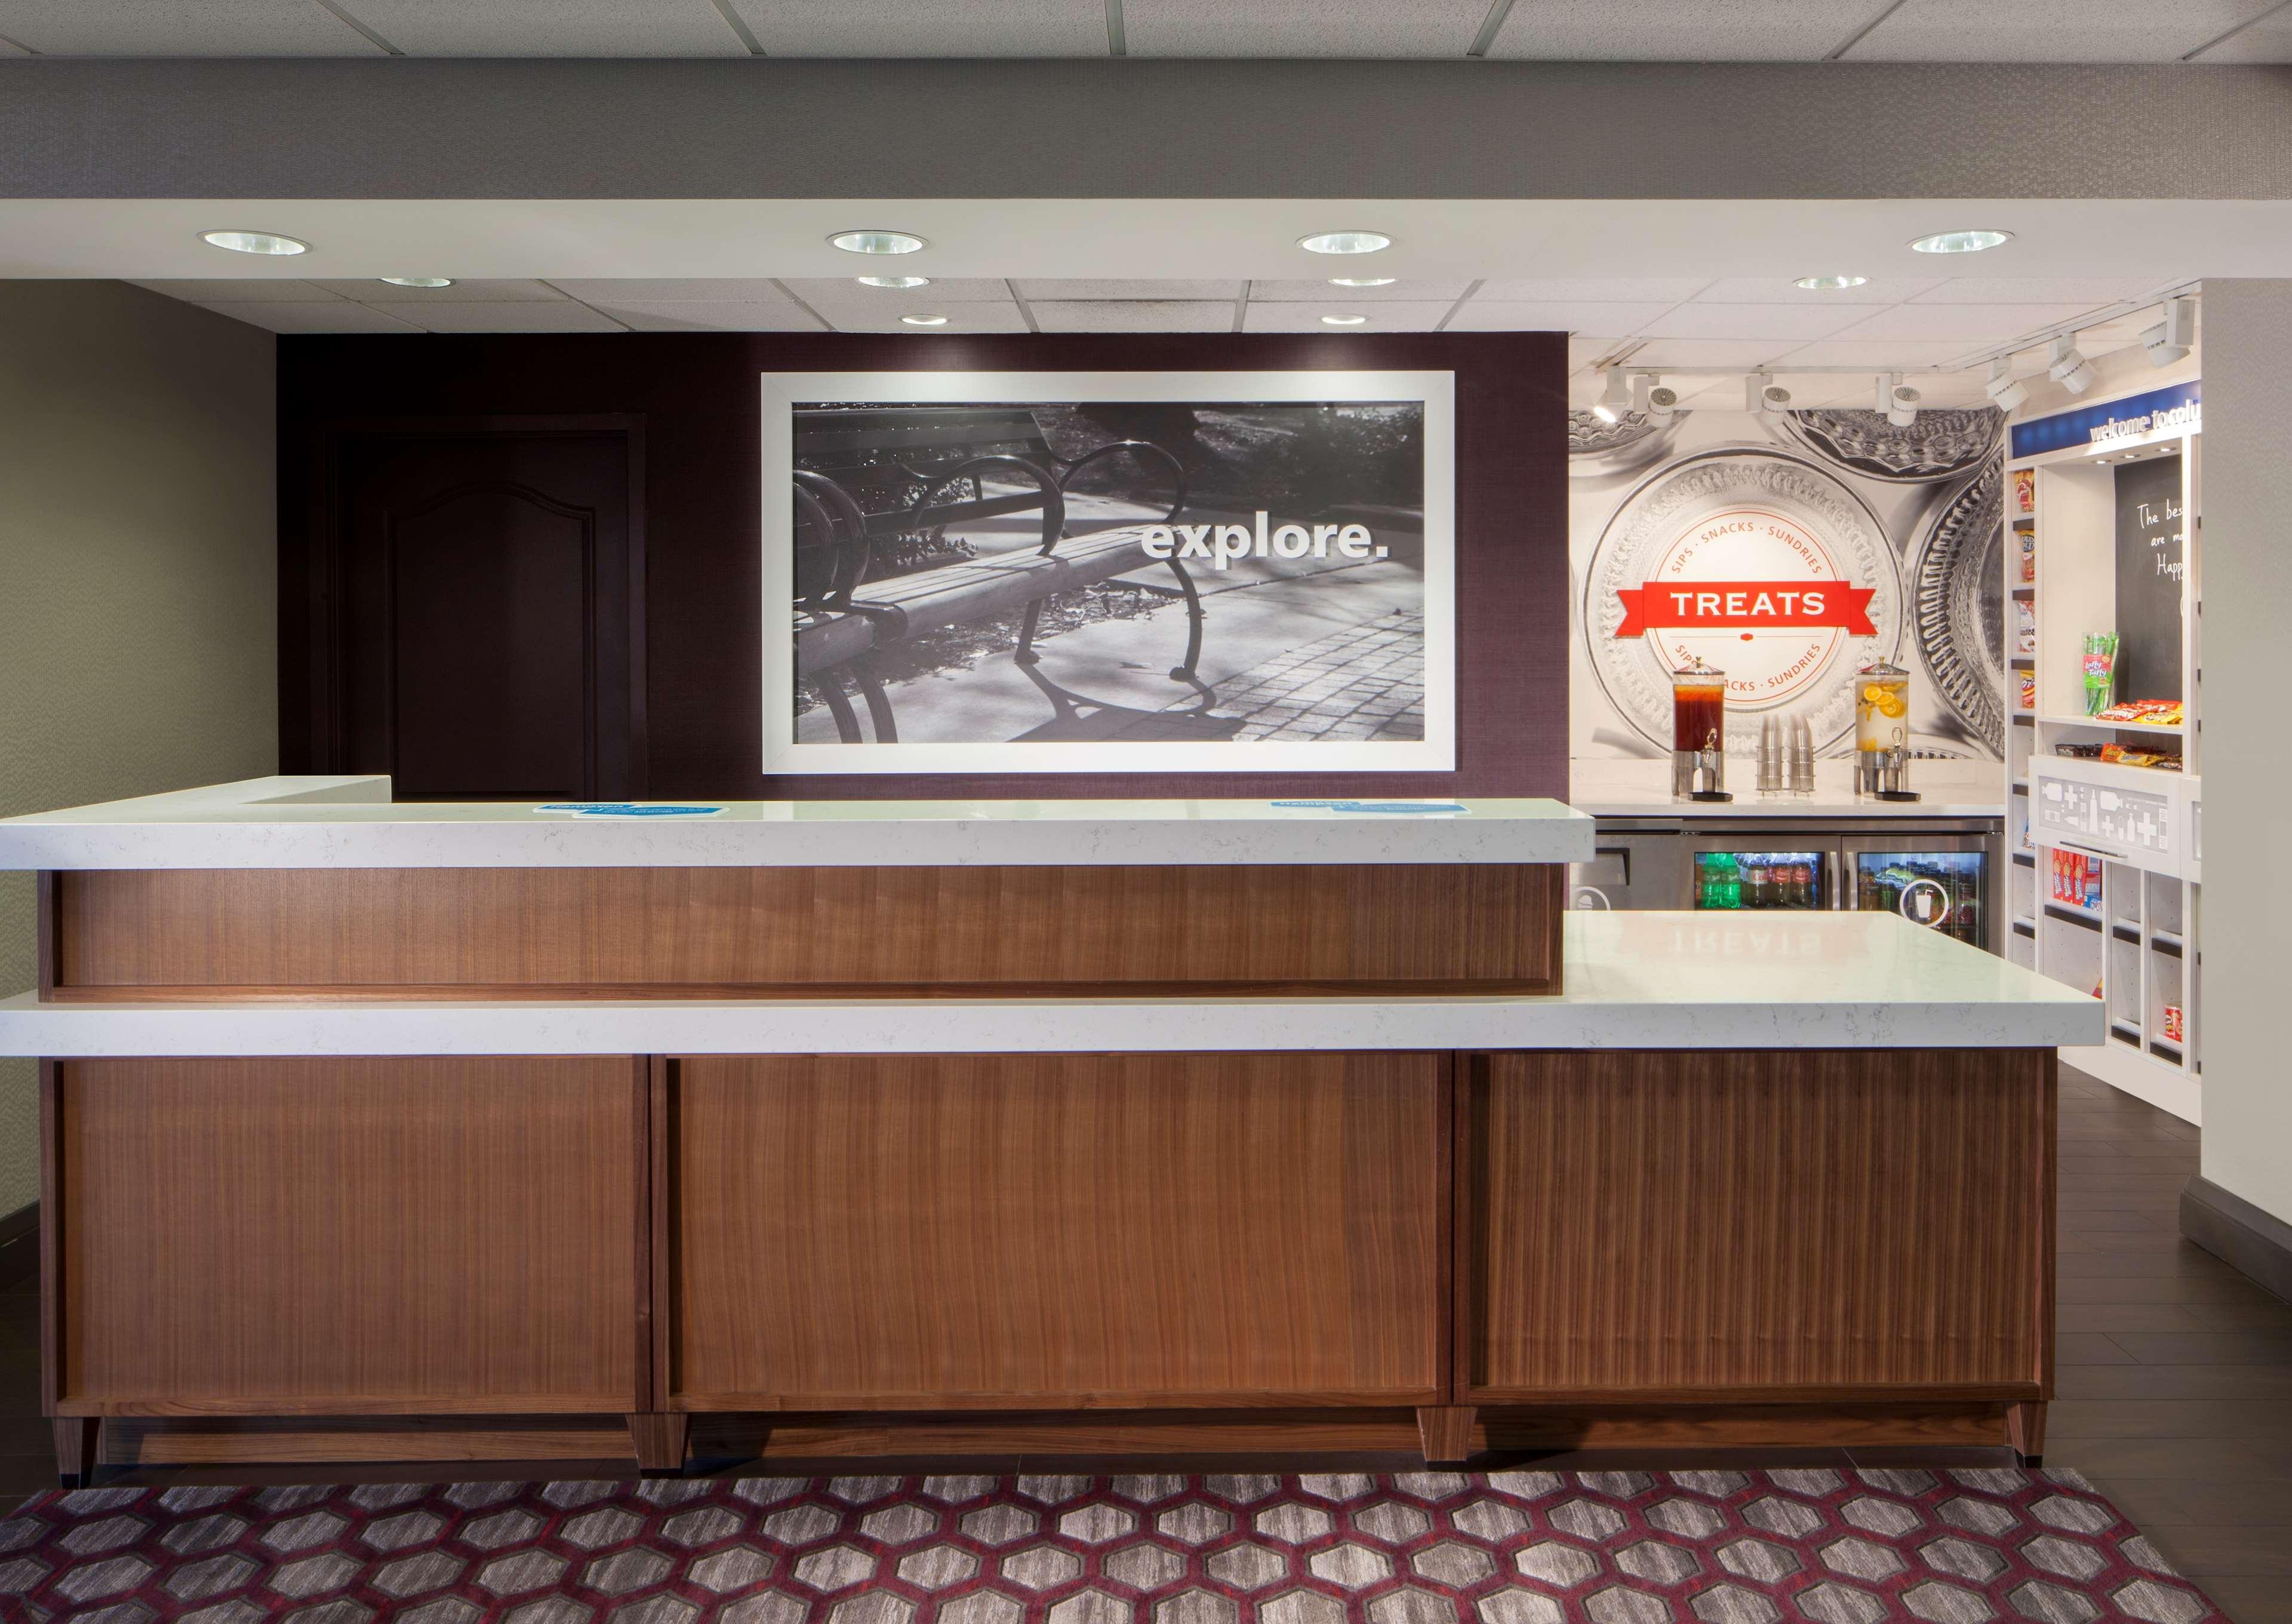 Hampton Inn & Suites Columbus-Easton Area image 2